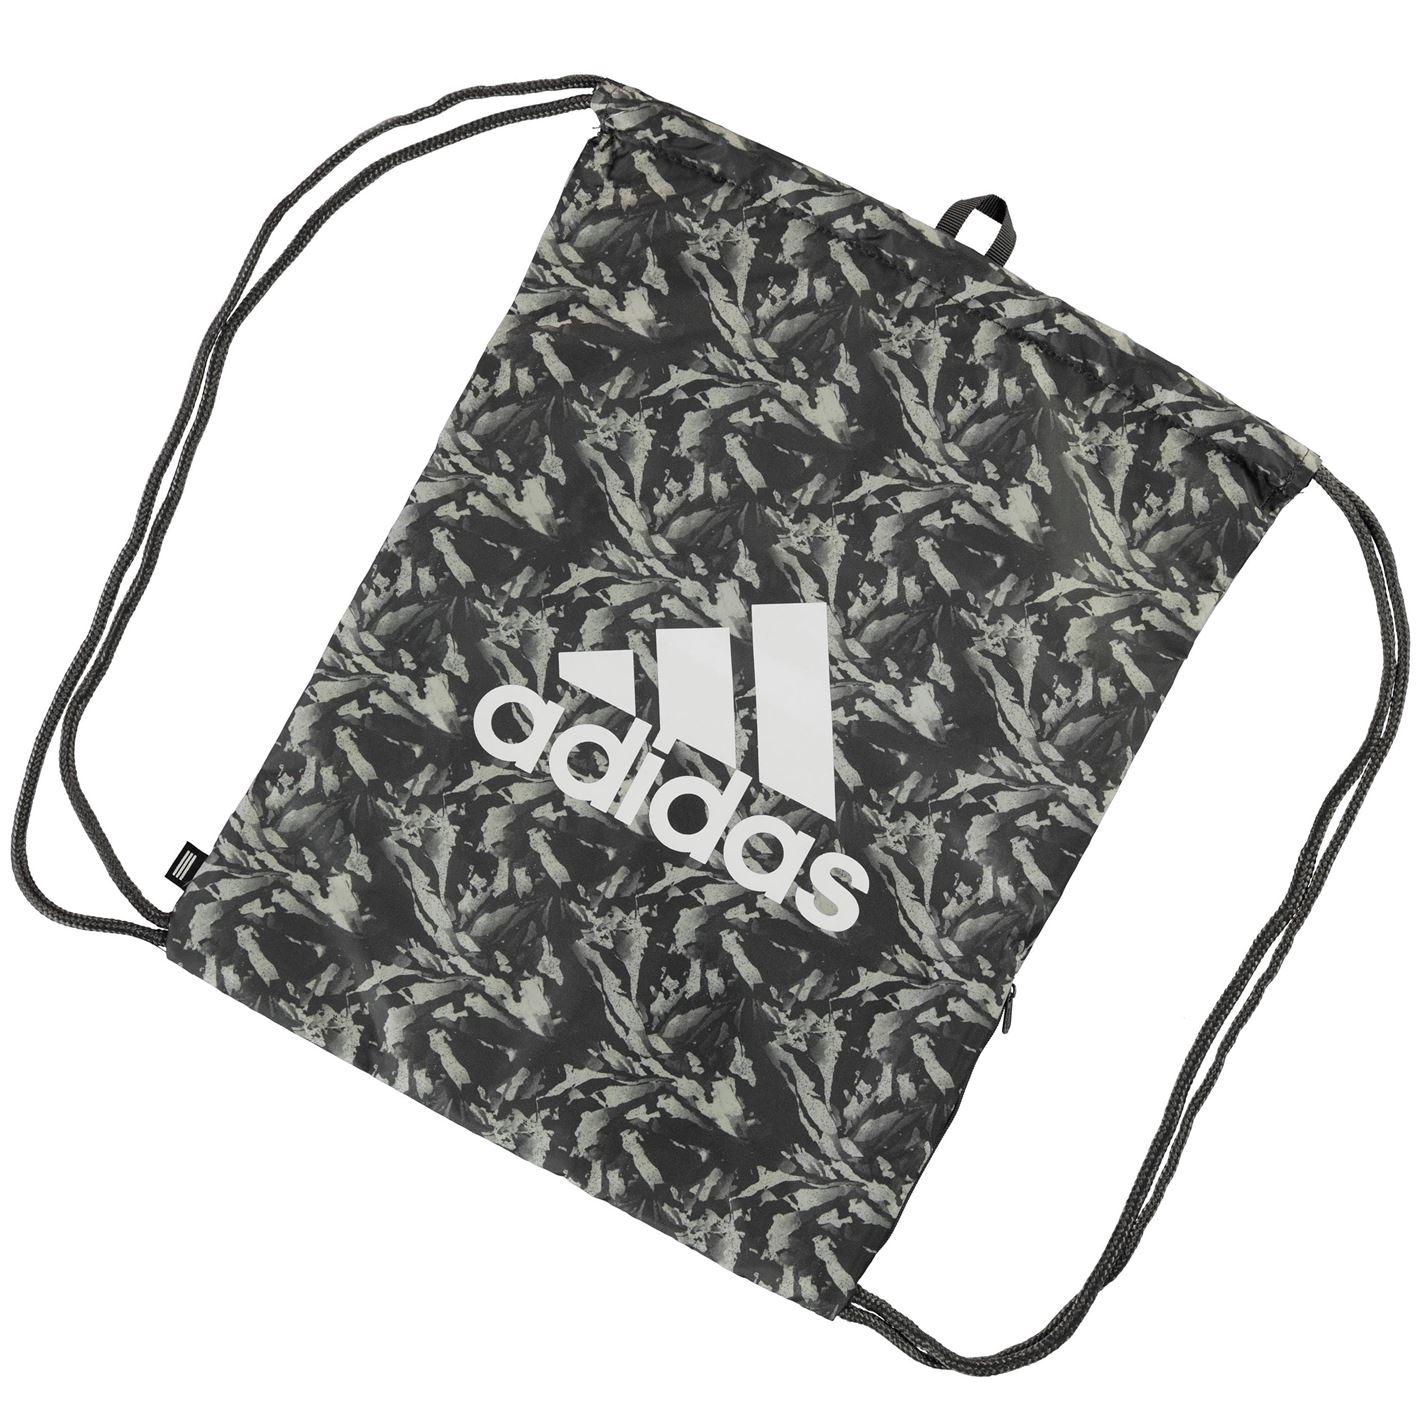 Adidas Print Gymsack